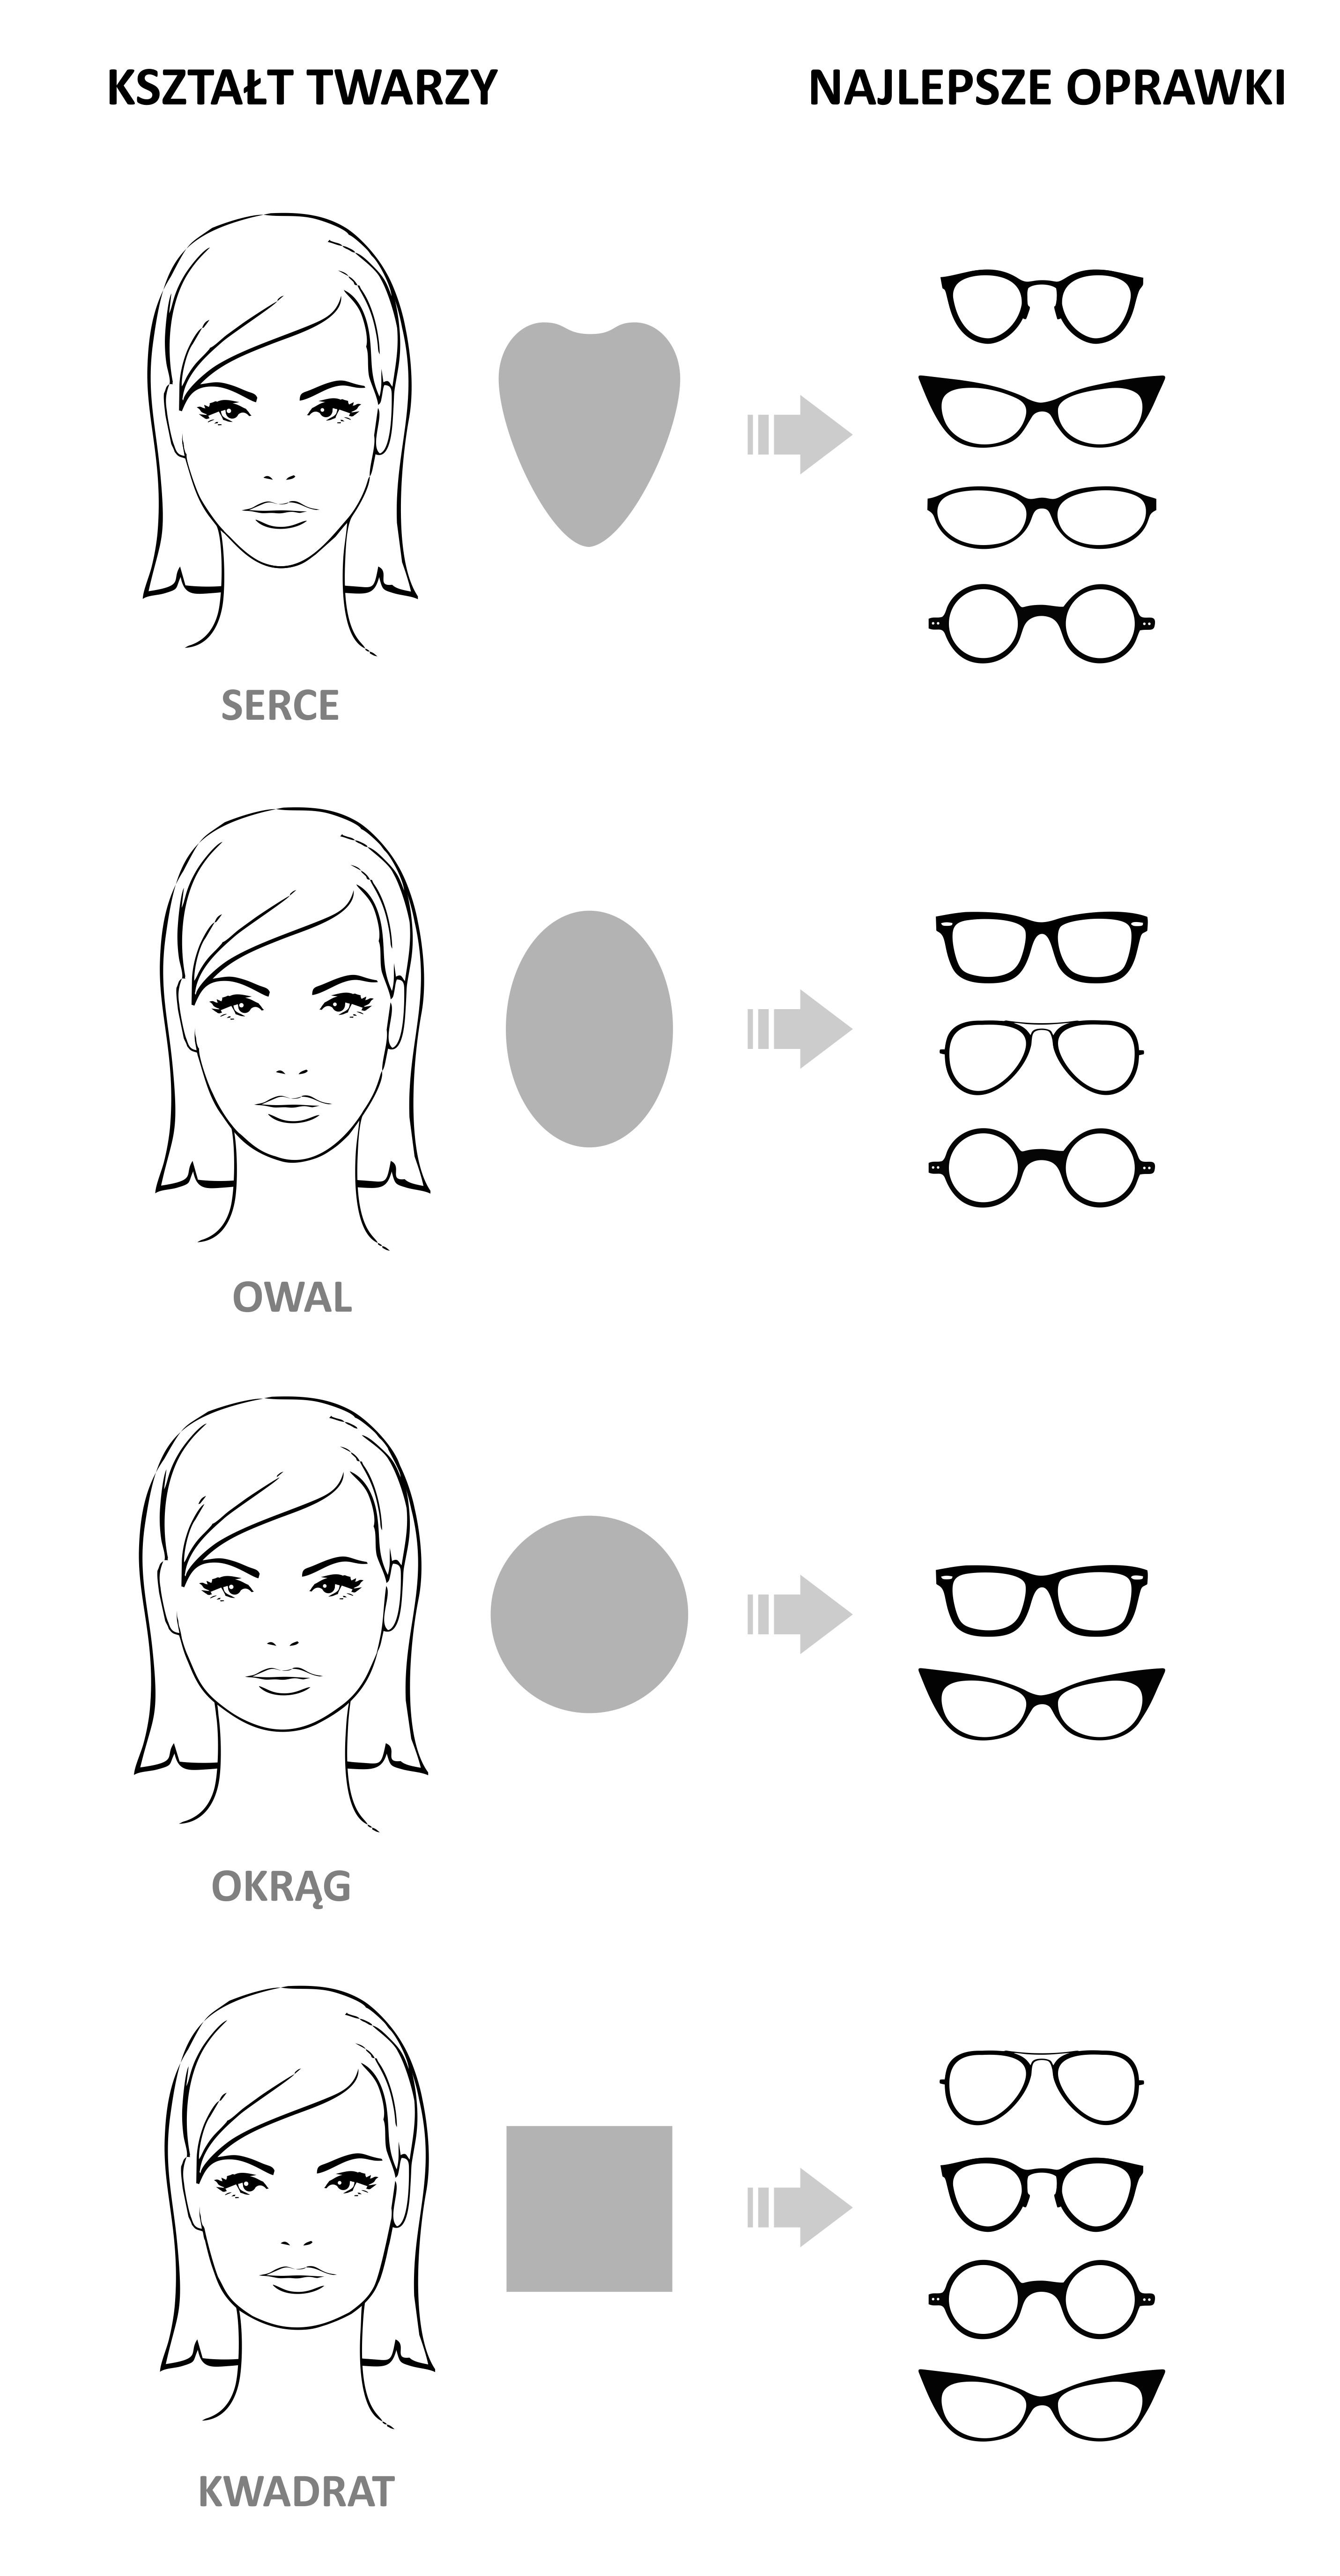 b70ef2d09d84ee Oprawki a kształt twarzy - producent, dystrybutor okularów AmericanWay